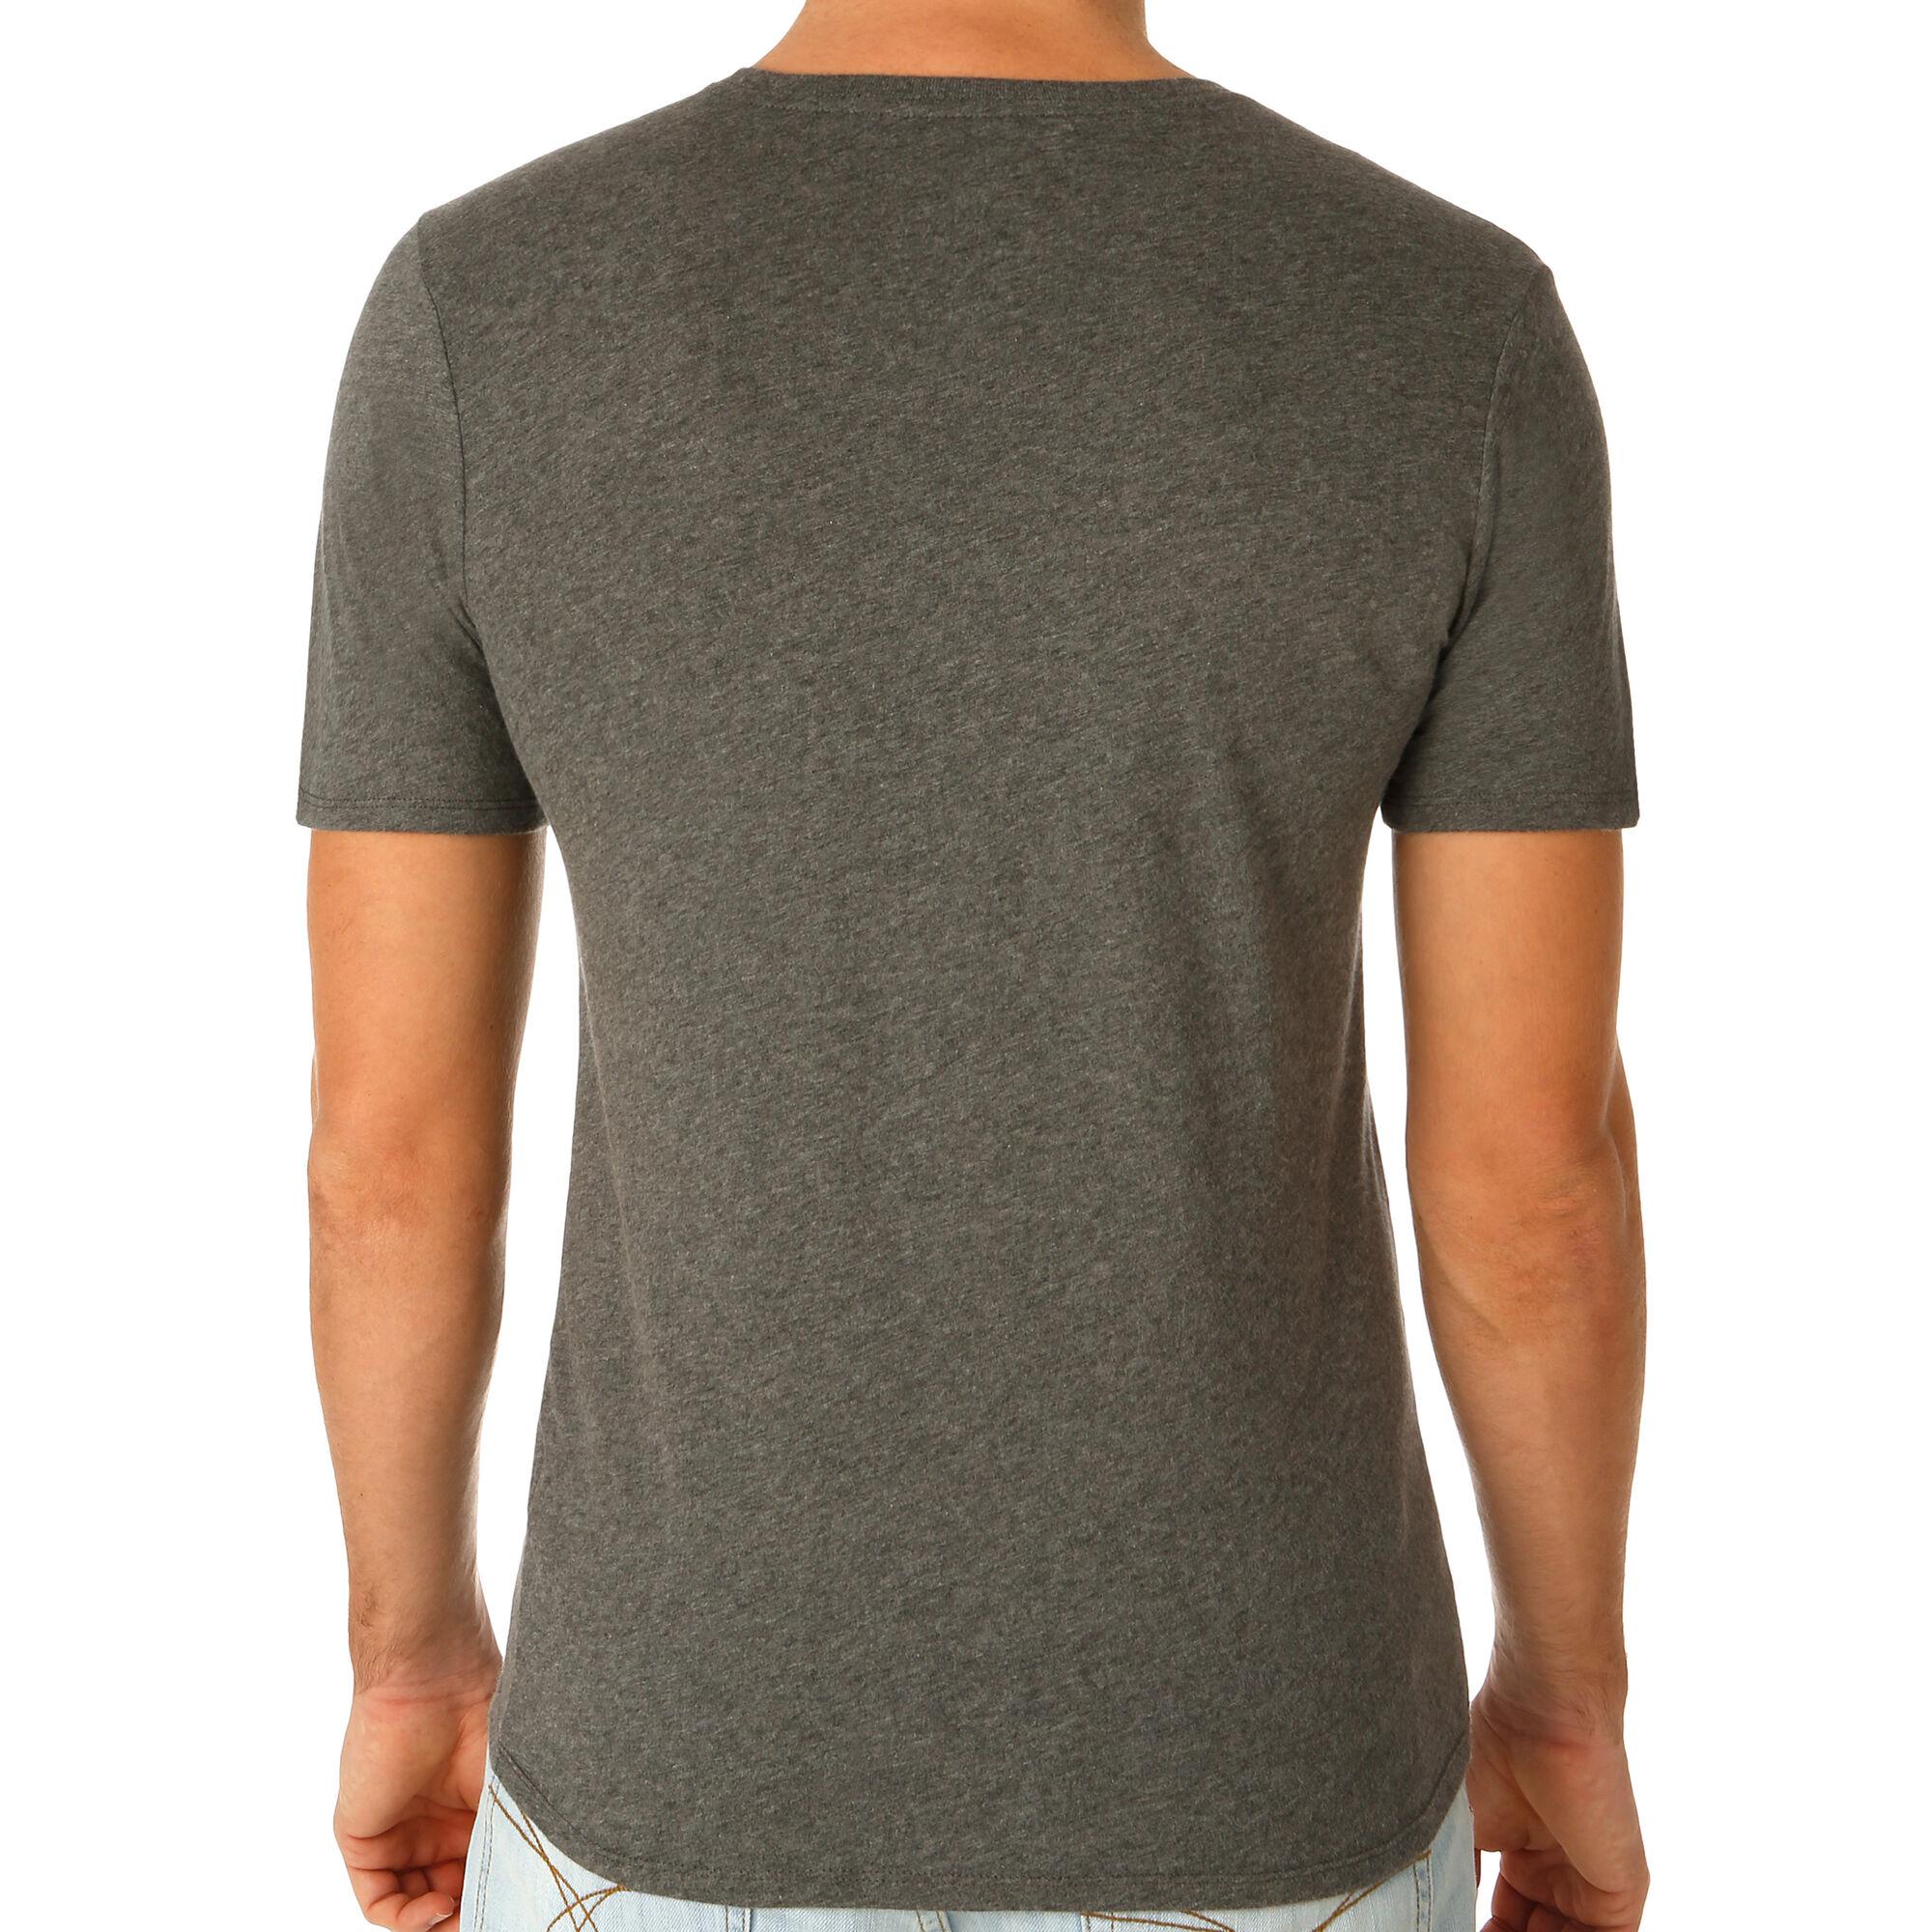 newest 46560 05cf6 ... Nike · Nike · Nike · Nike · Nike. Sportswear Futura Icon T-Shirt ...